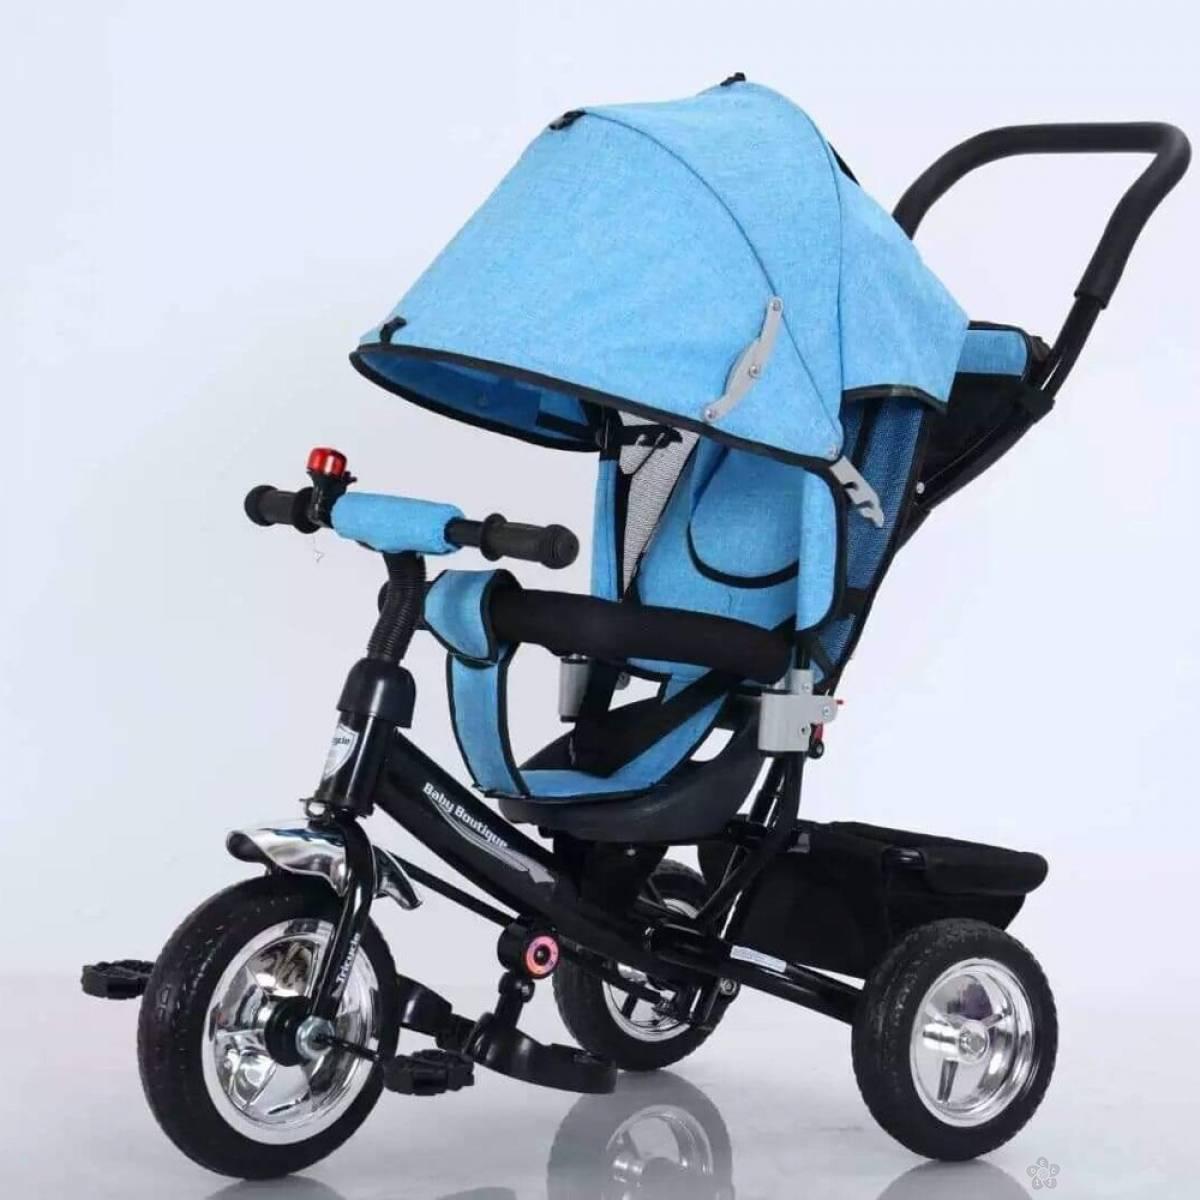 Tricikl plavi BJ269